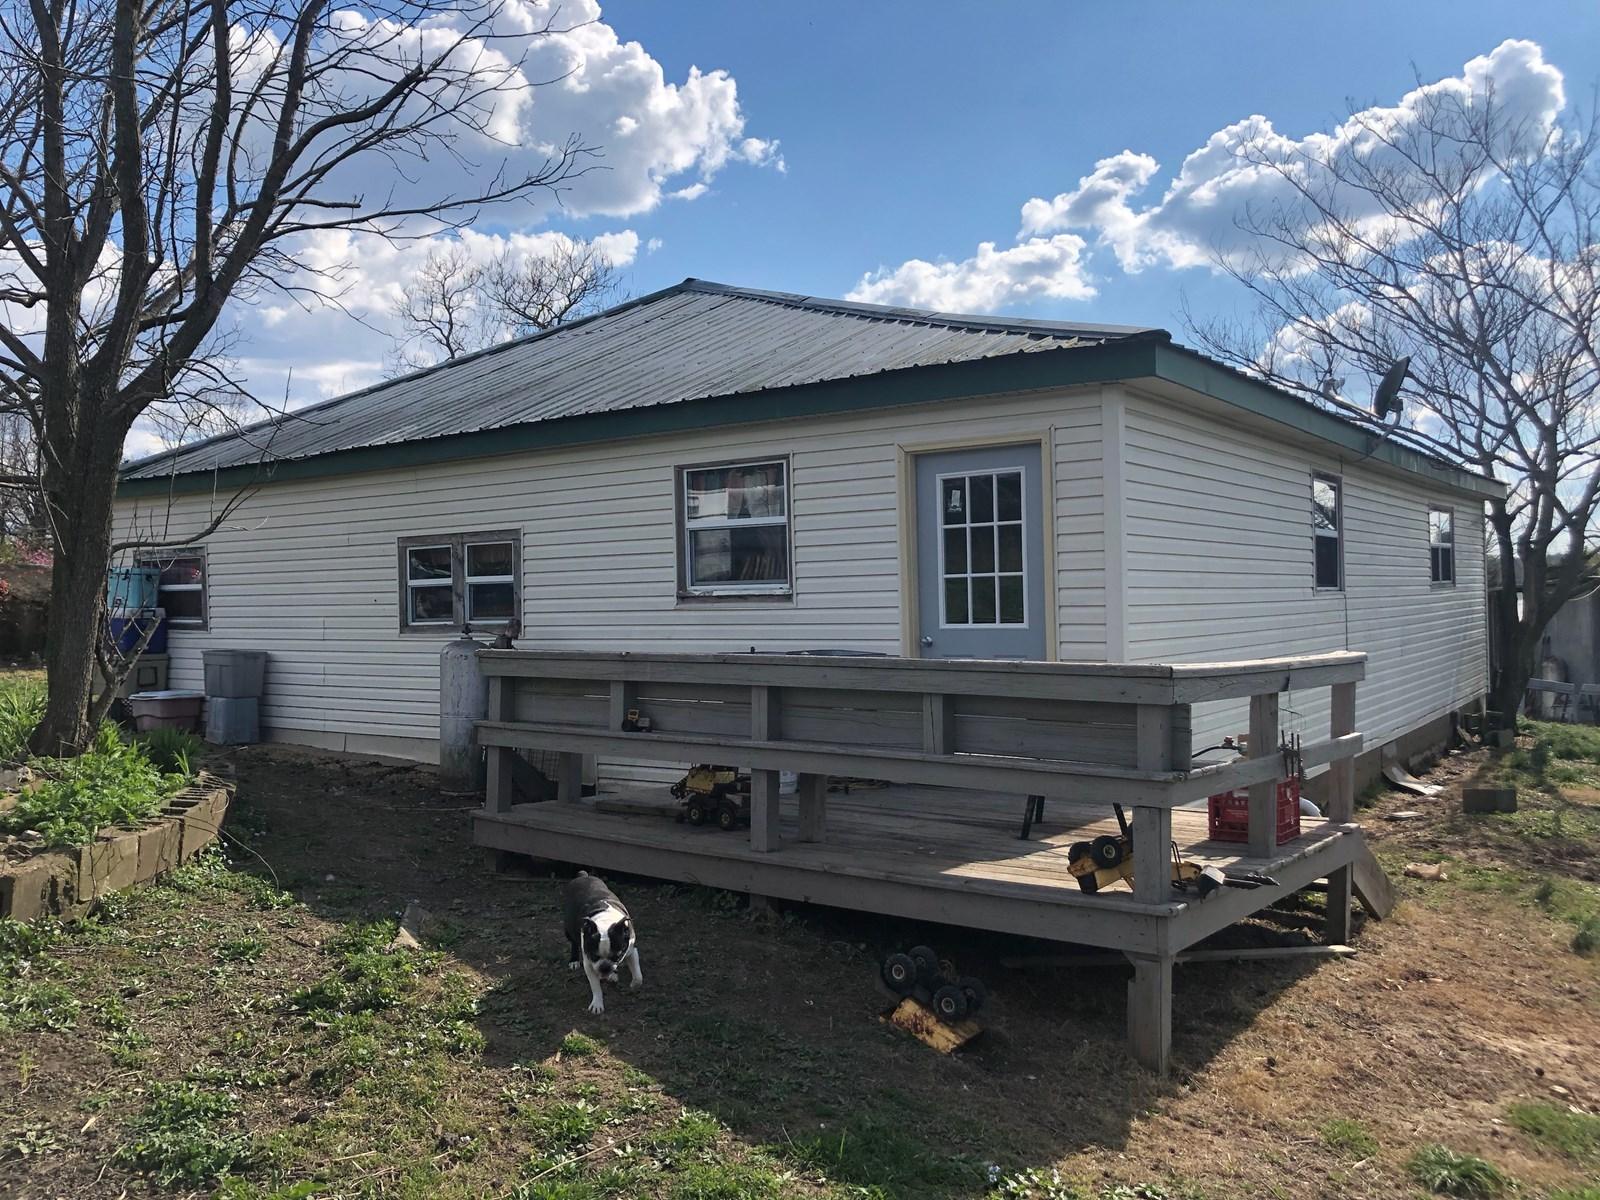 Country Home for Sale in Winona Missouri